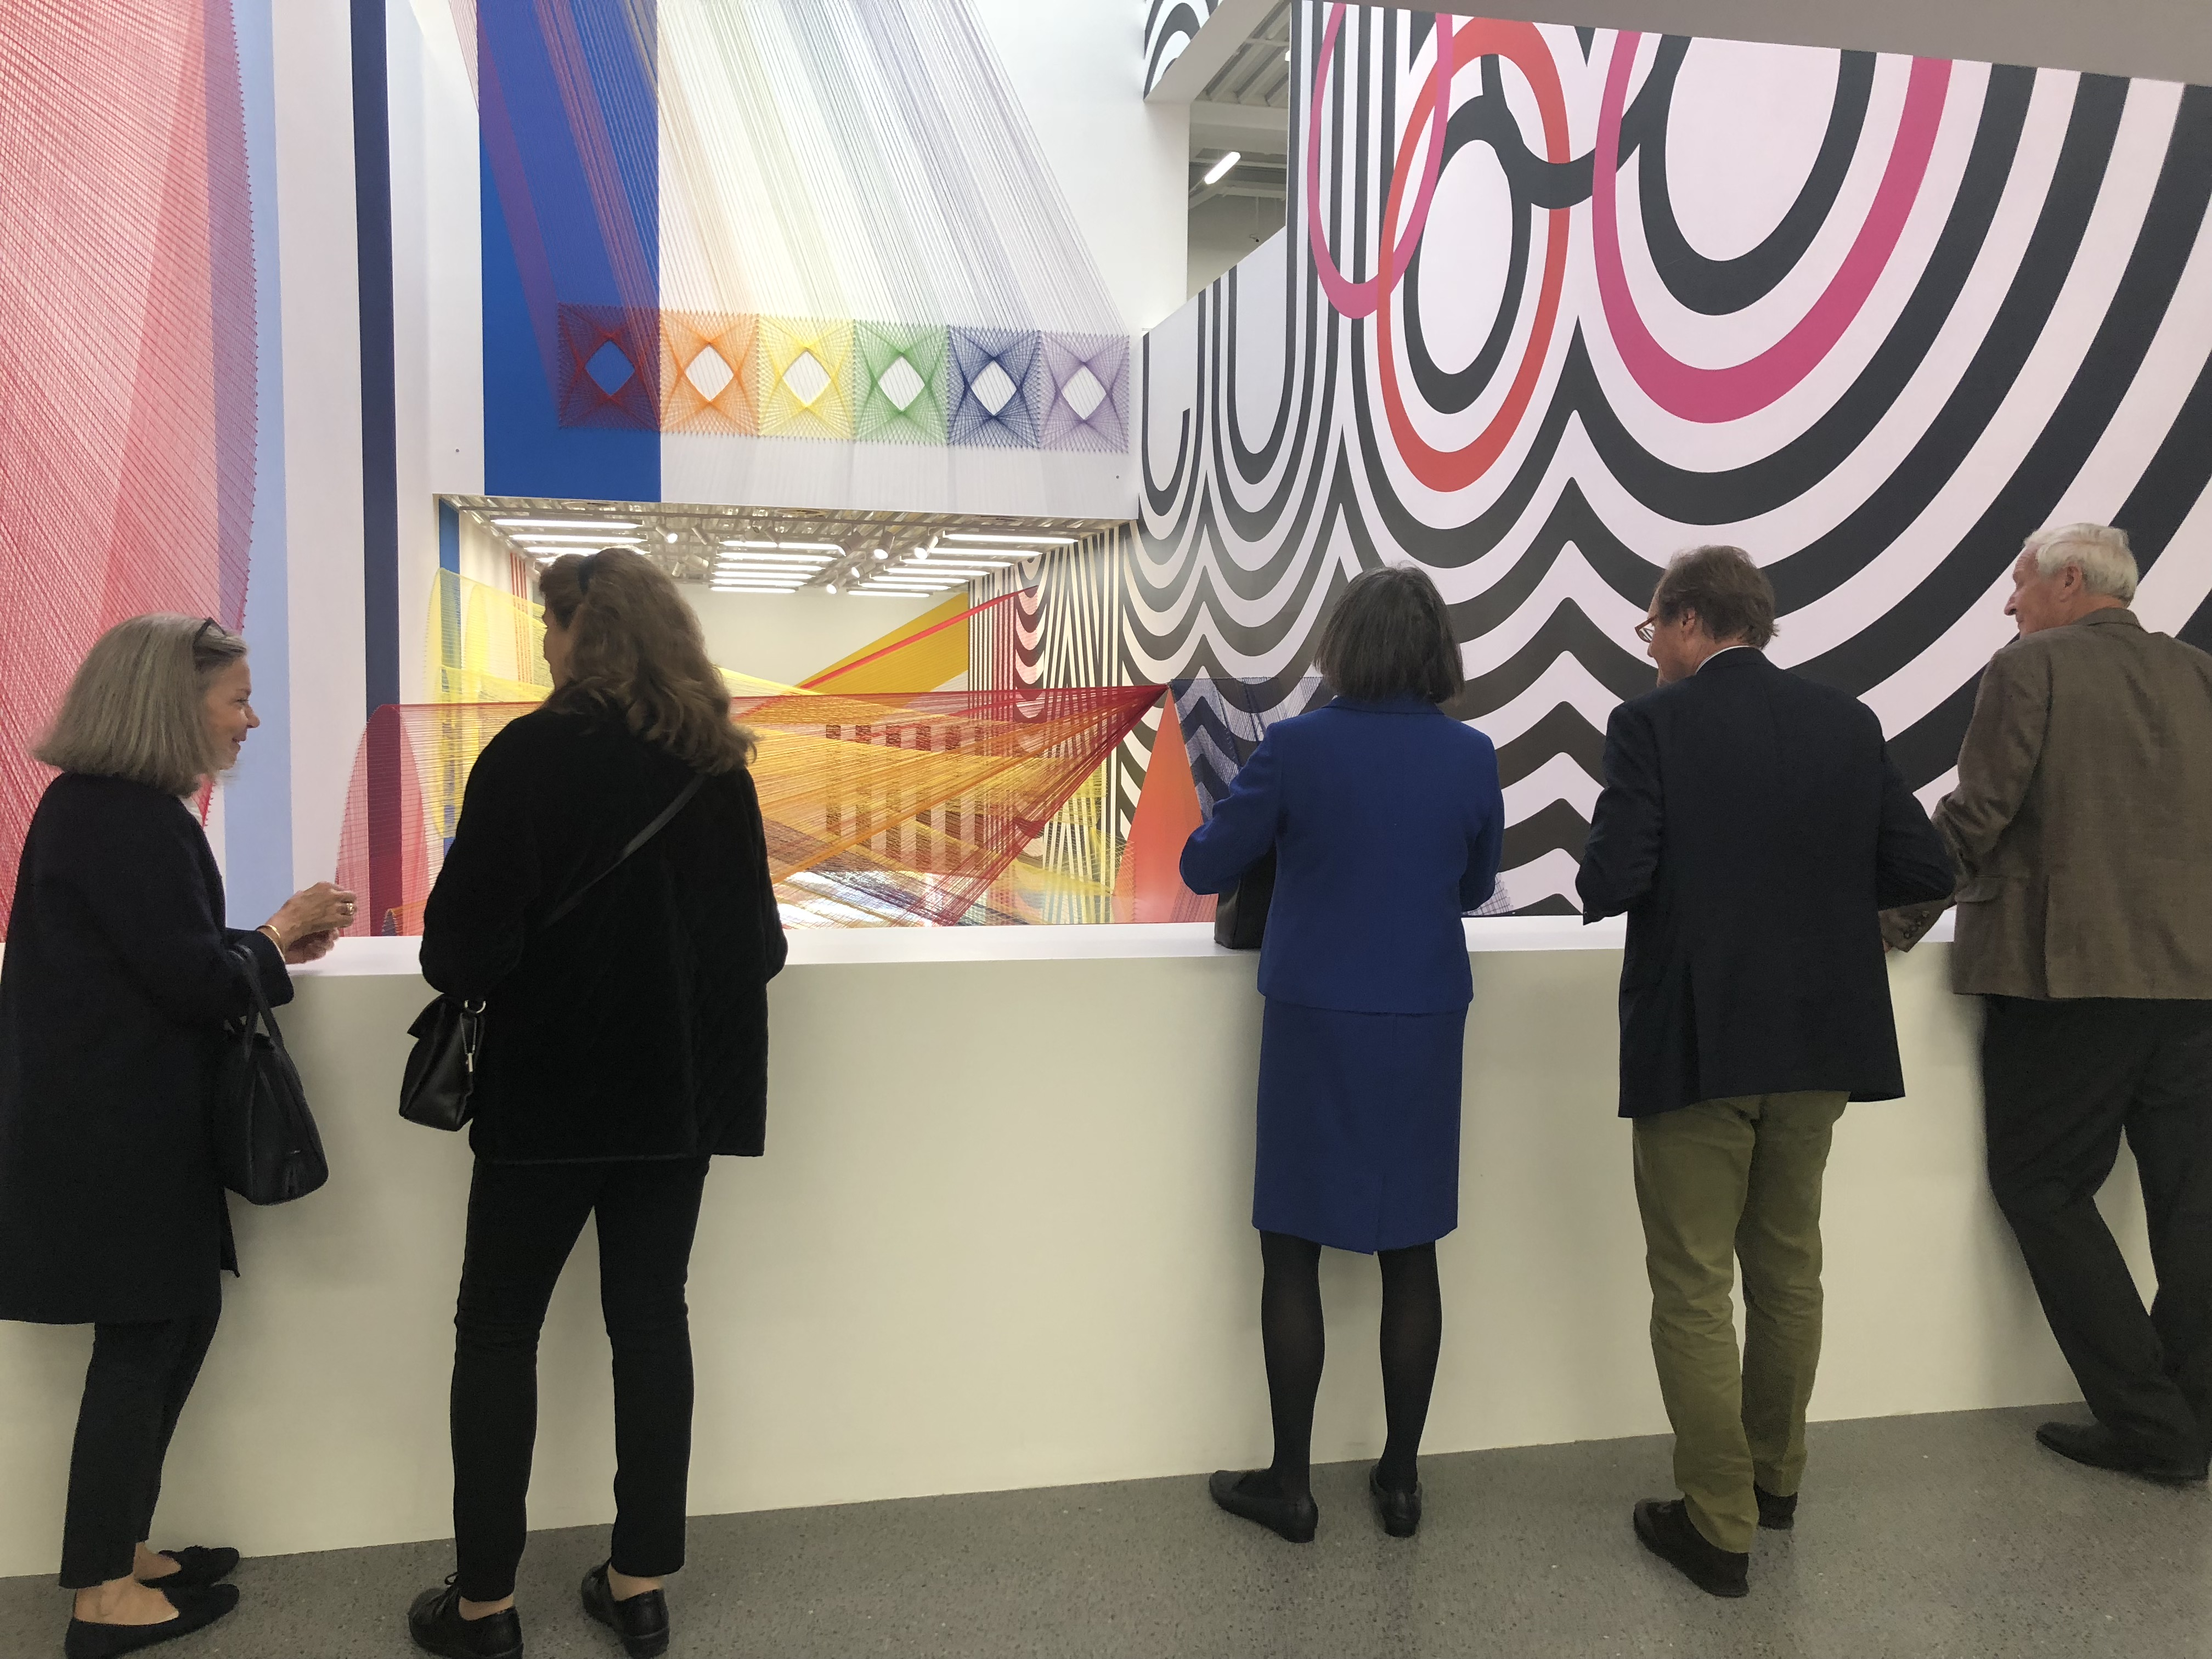 Besuch des Saarlandmuseums in Saarbrücken